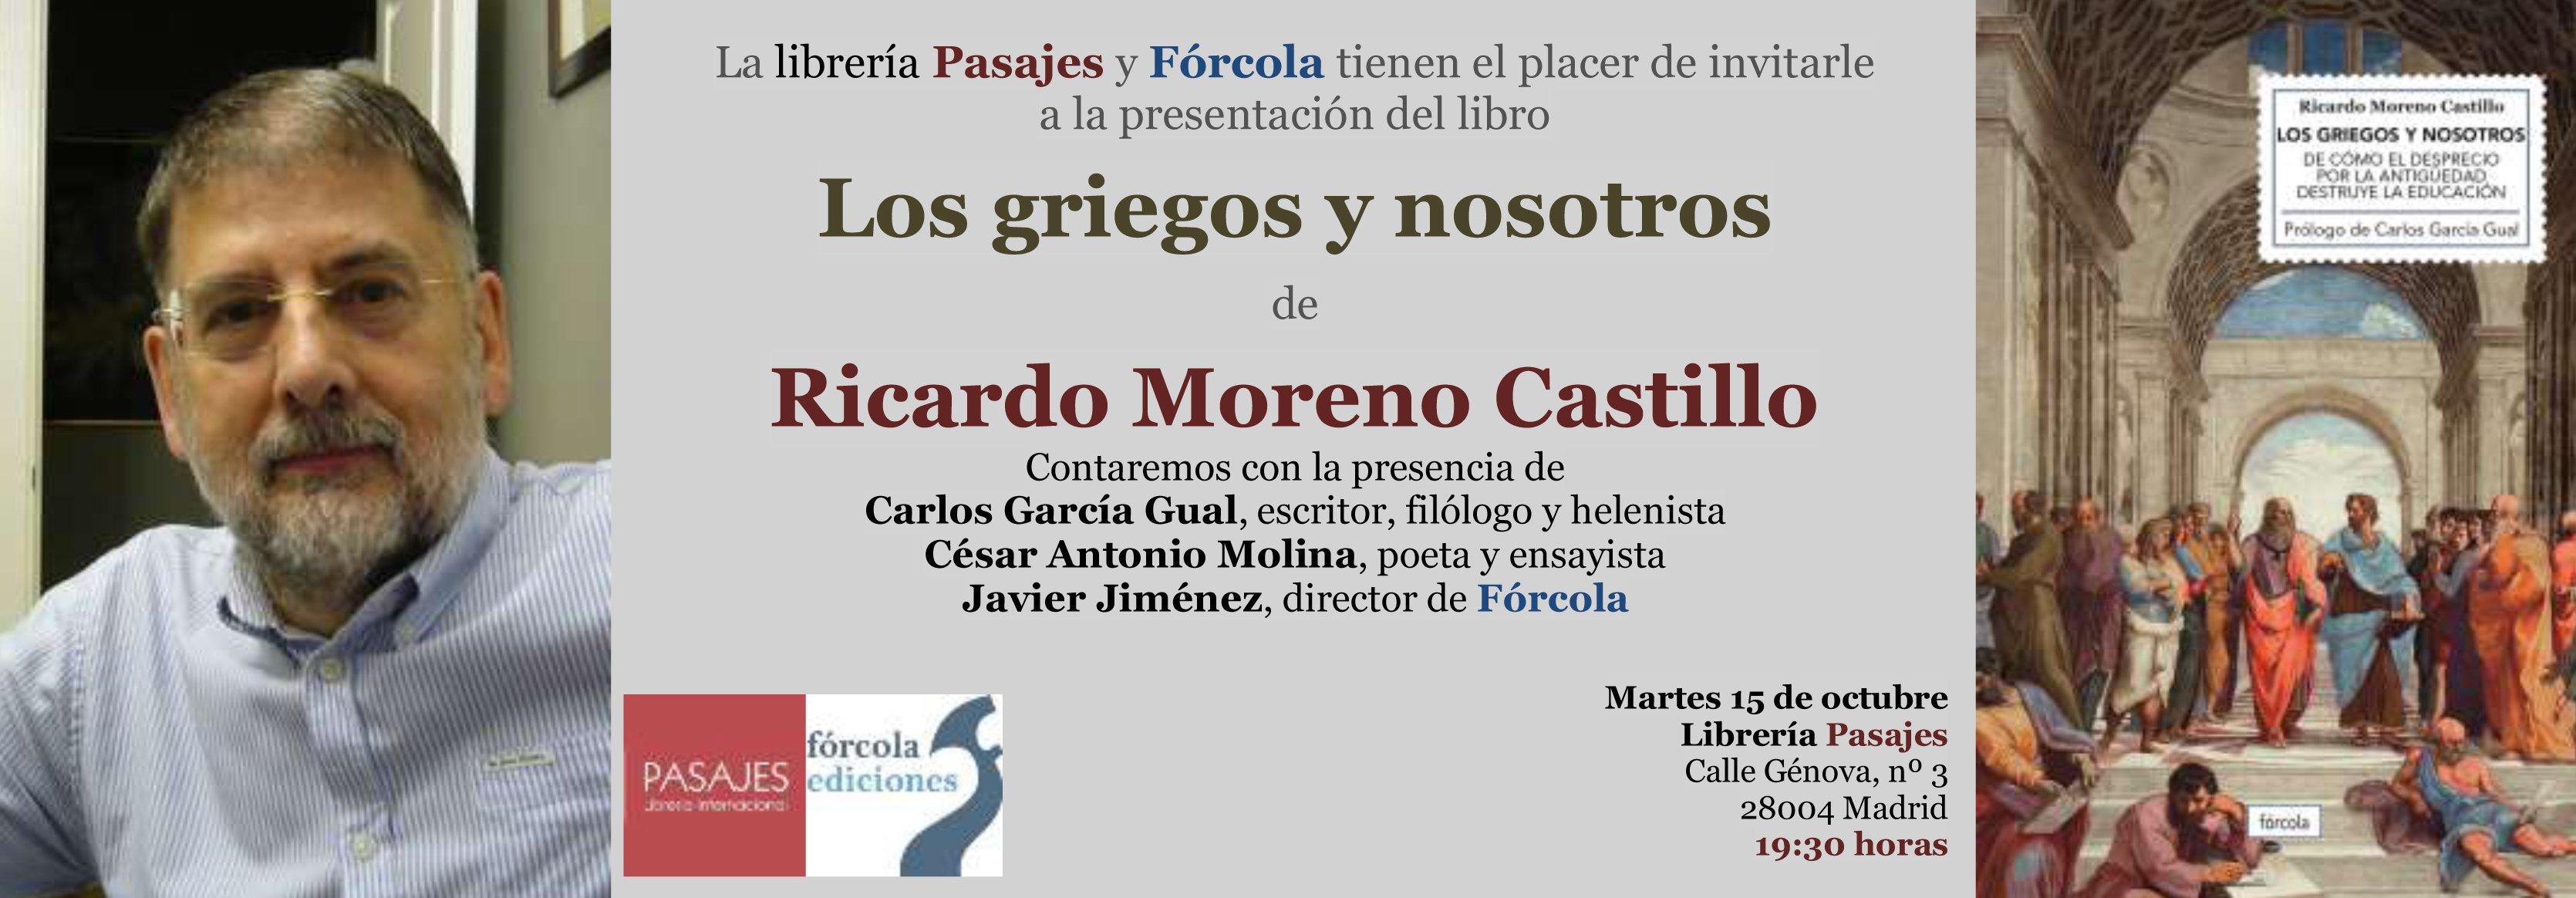 pasajes Ricardo Moreno Castillo